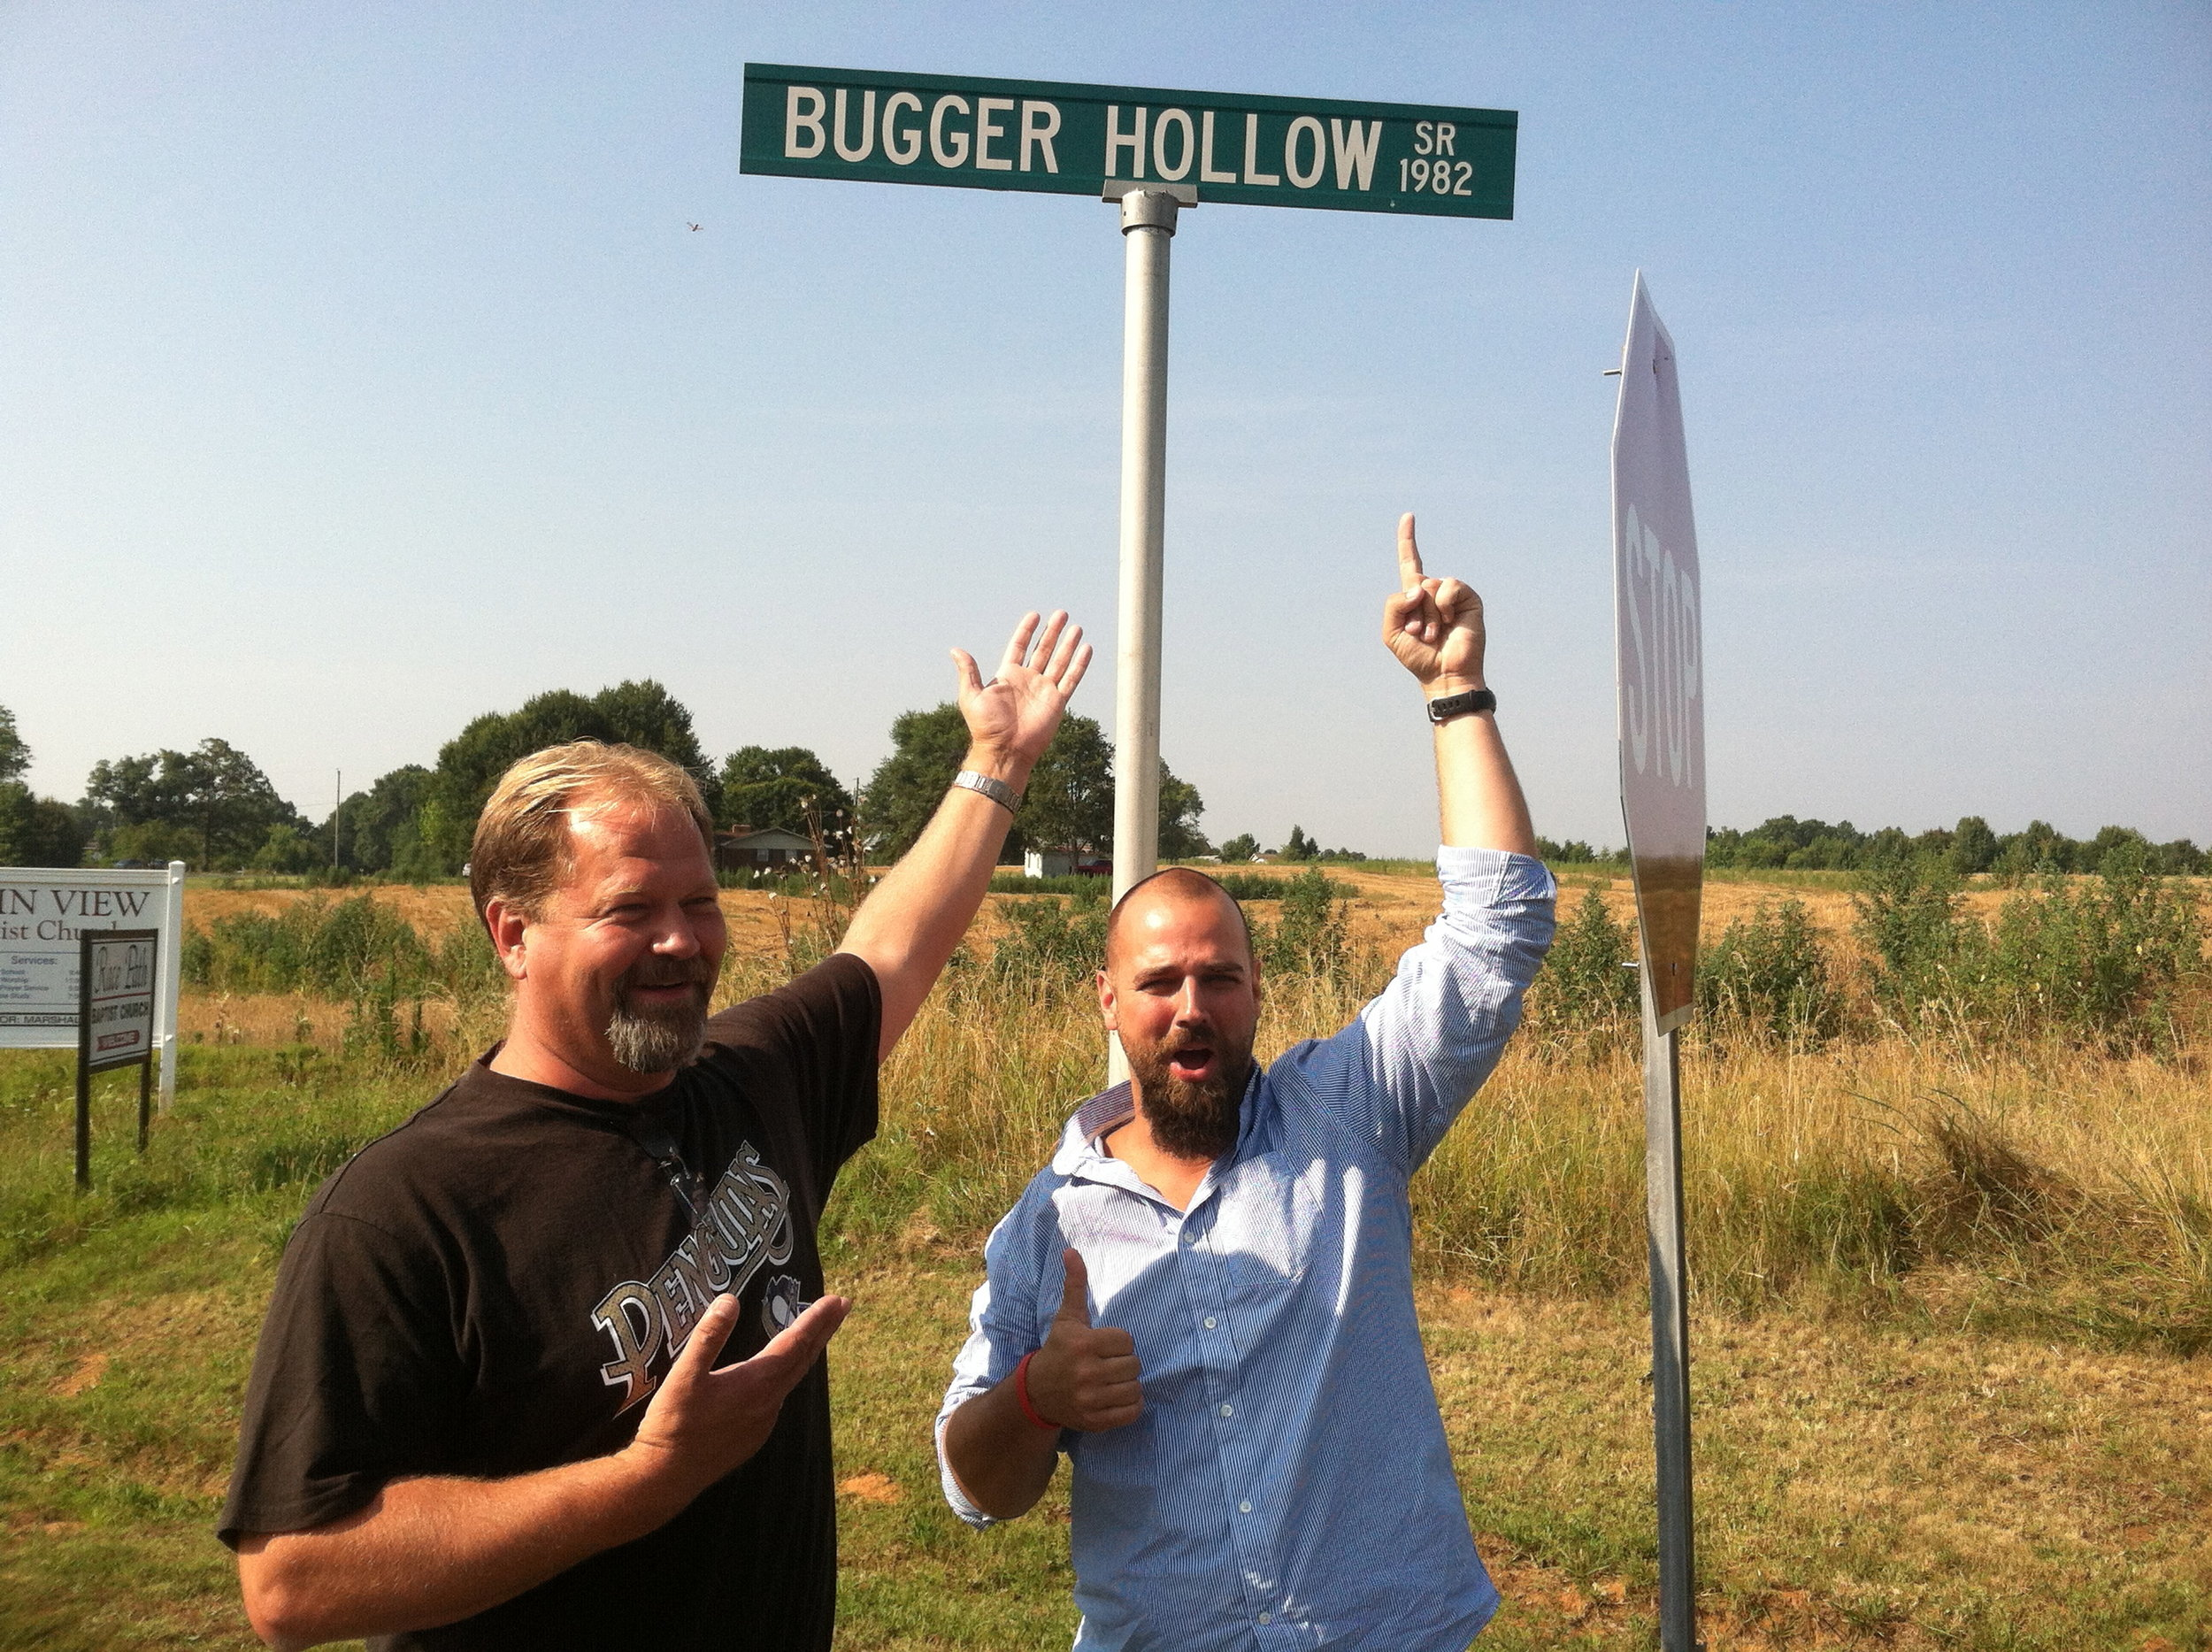 Jeff Sundell & Troy Cooper @ Bugger Hollow